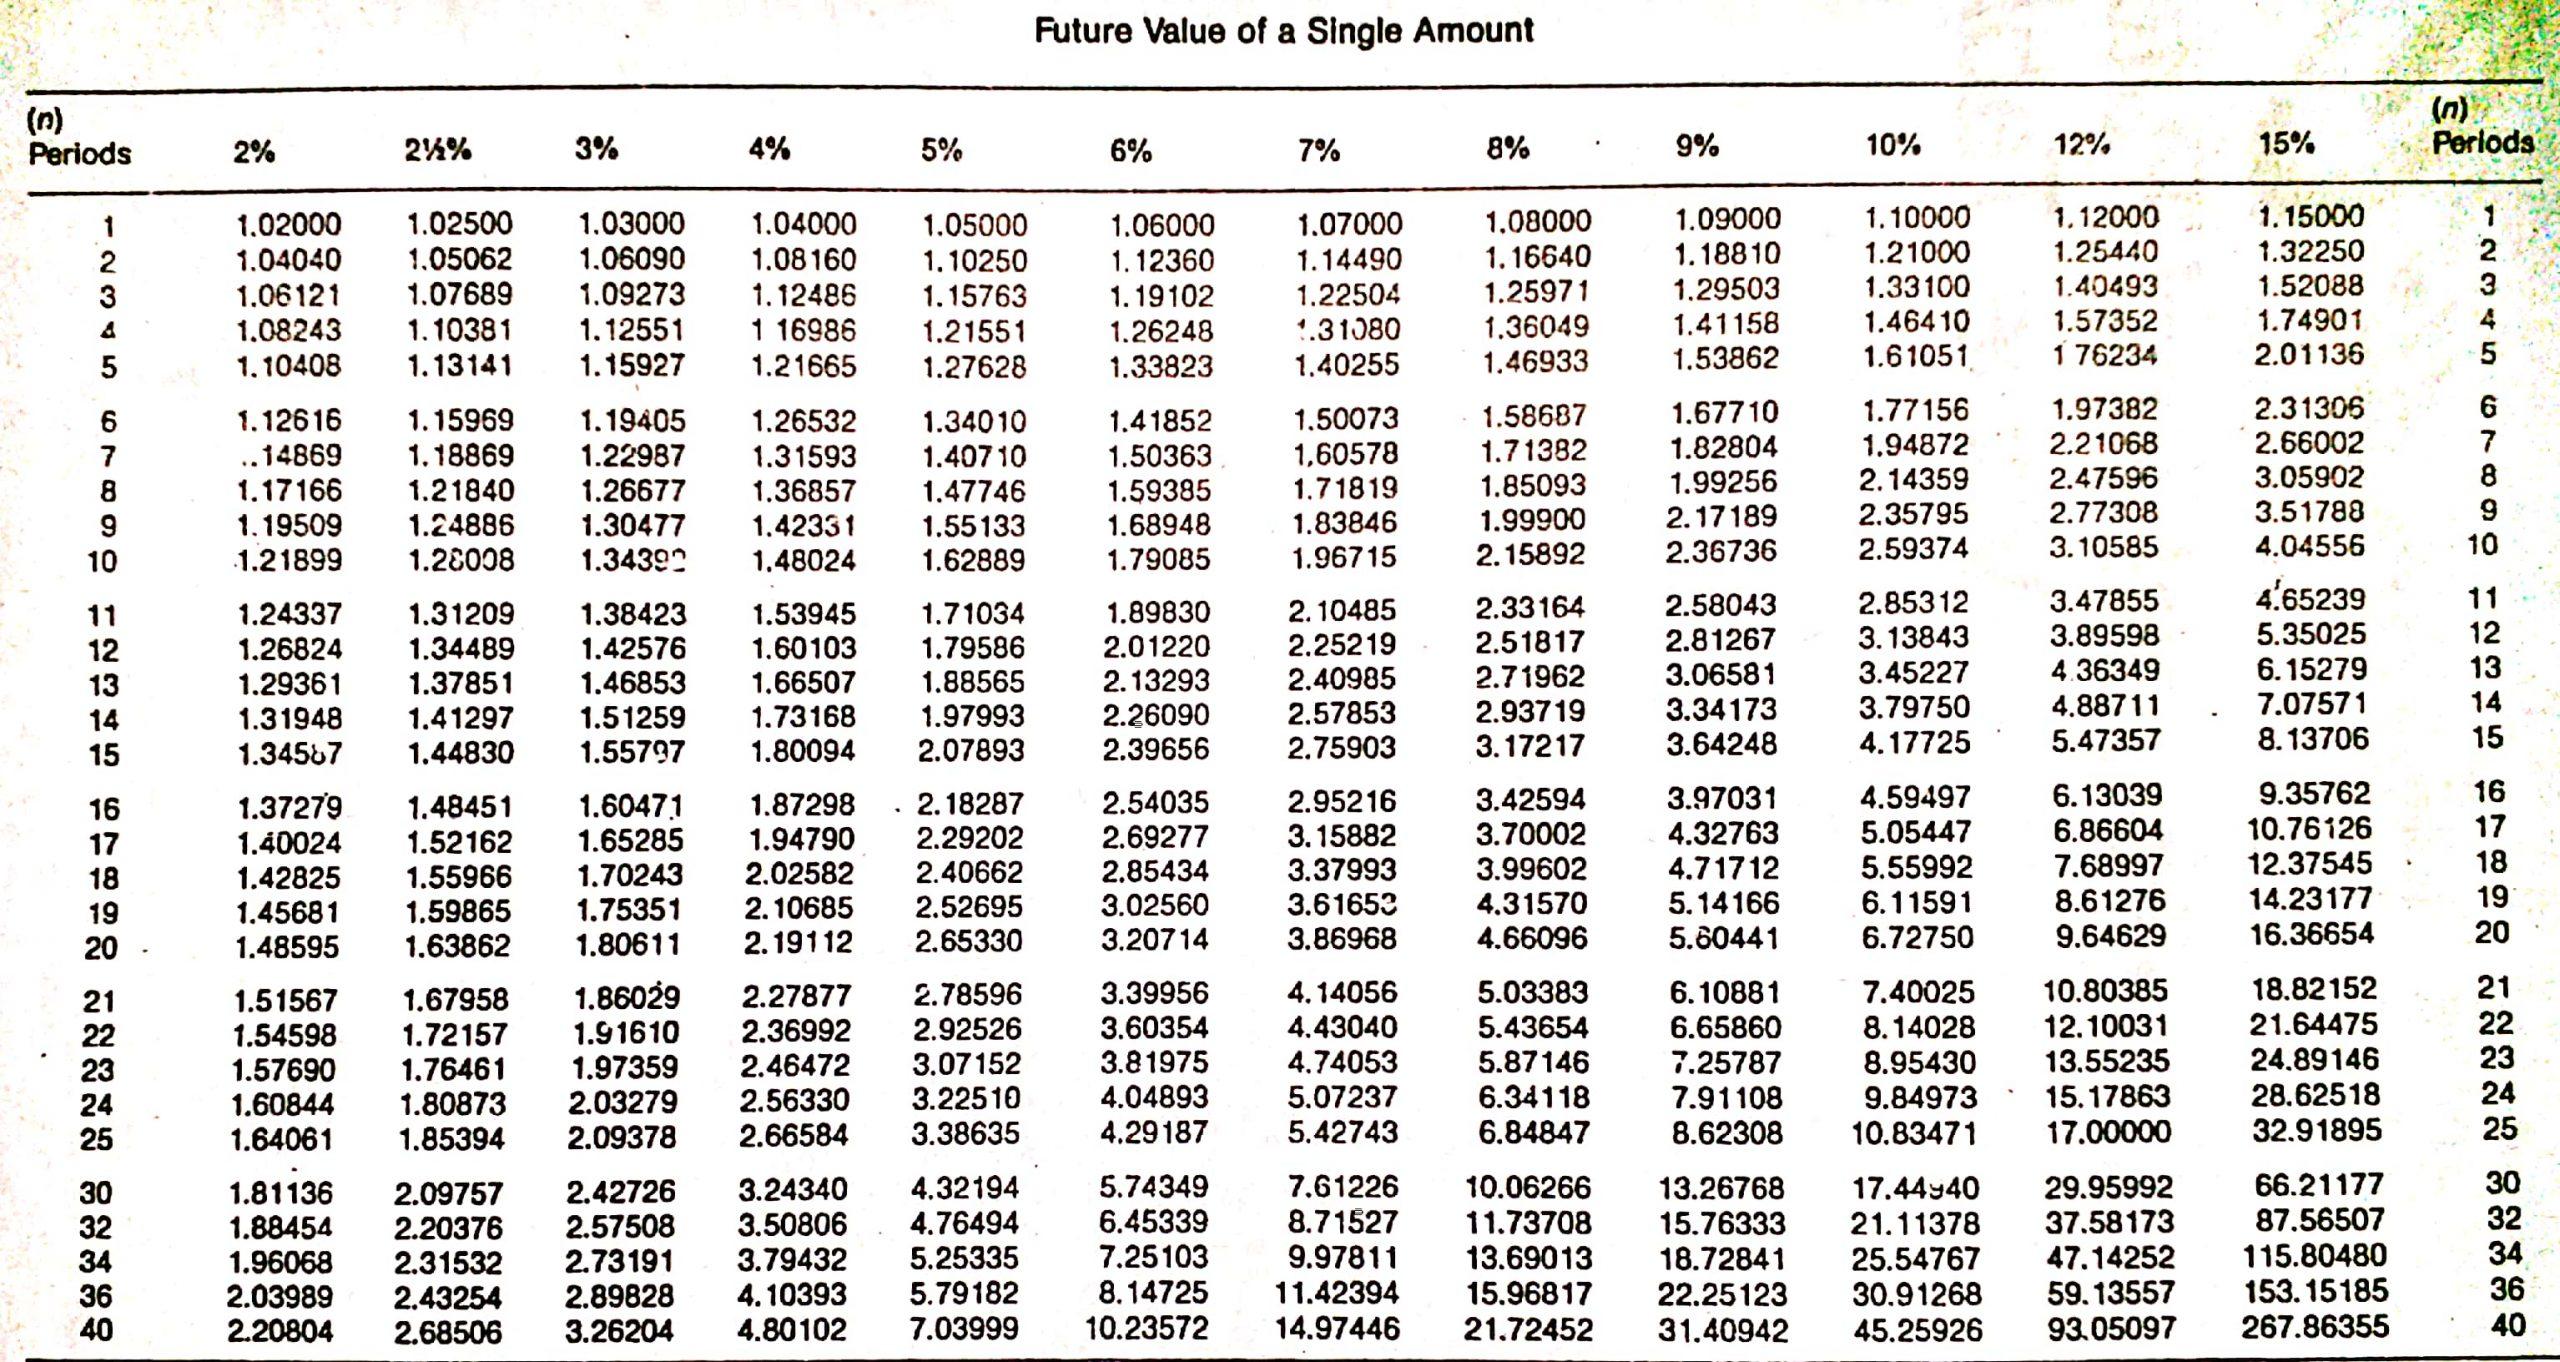 Table - Future Value of a single amount